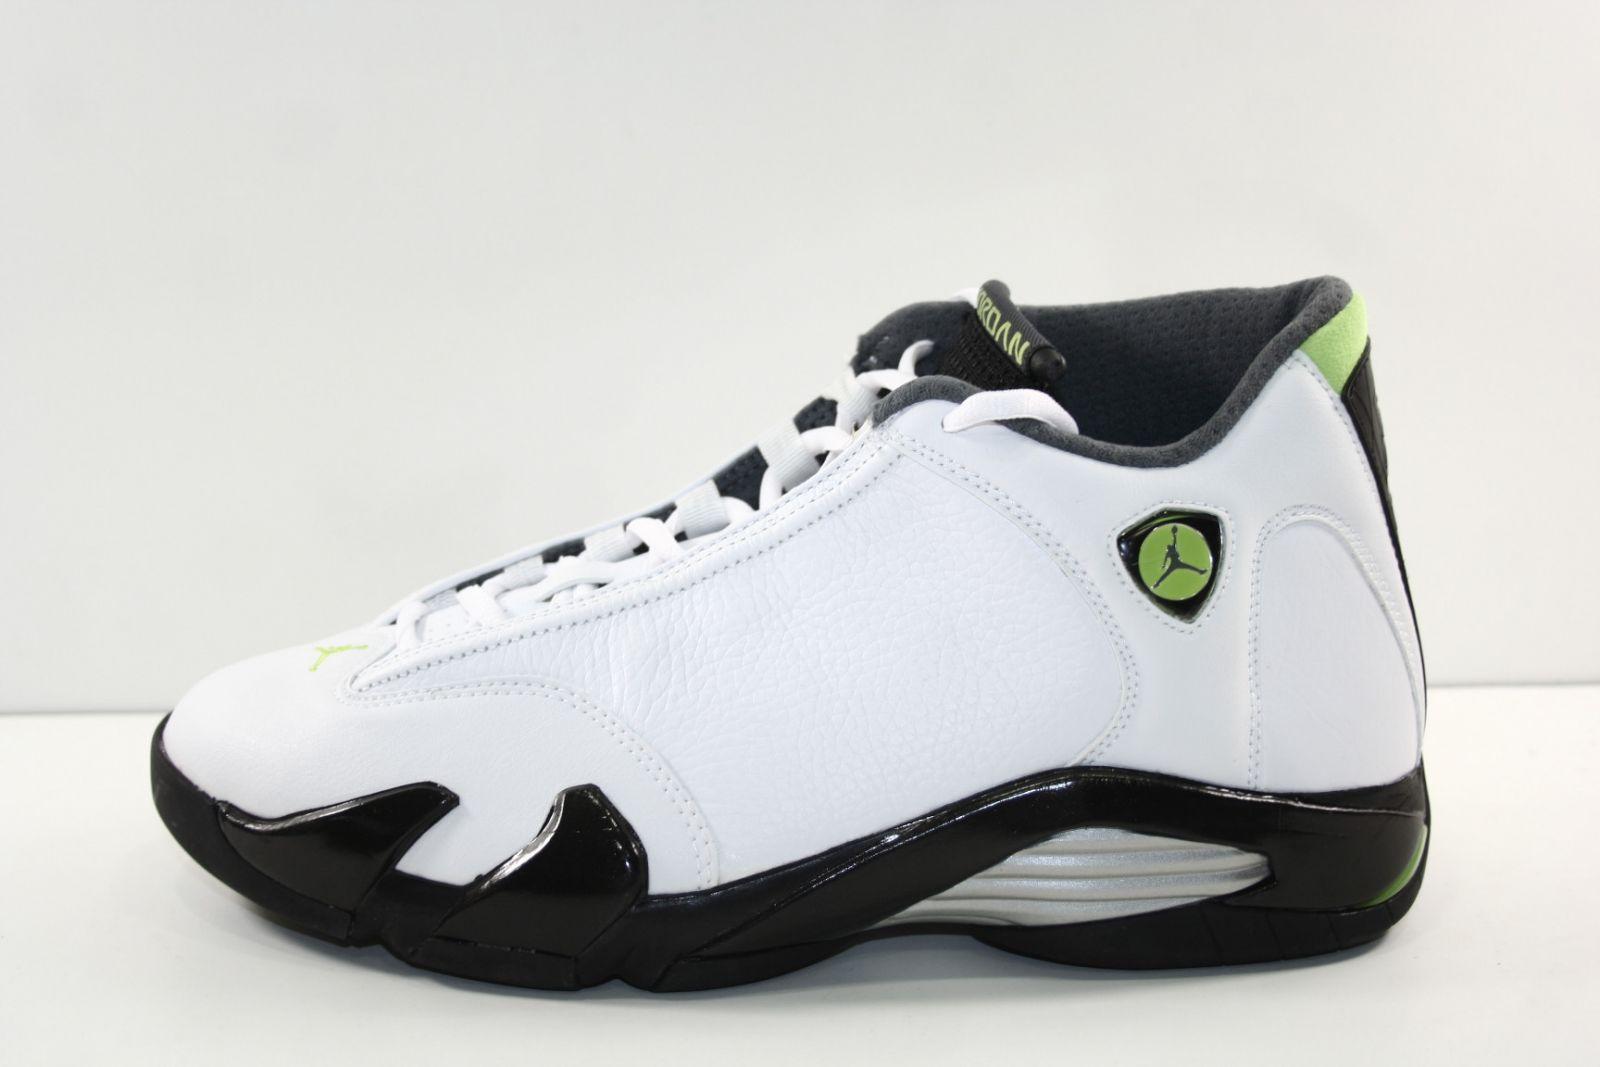 153ea0fdd8ff4f Sole Decade The Top 10 Shoes of 2005